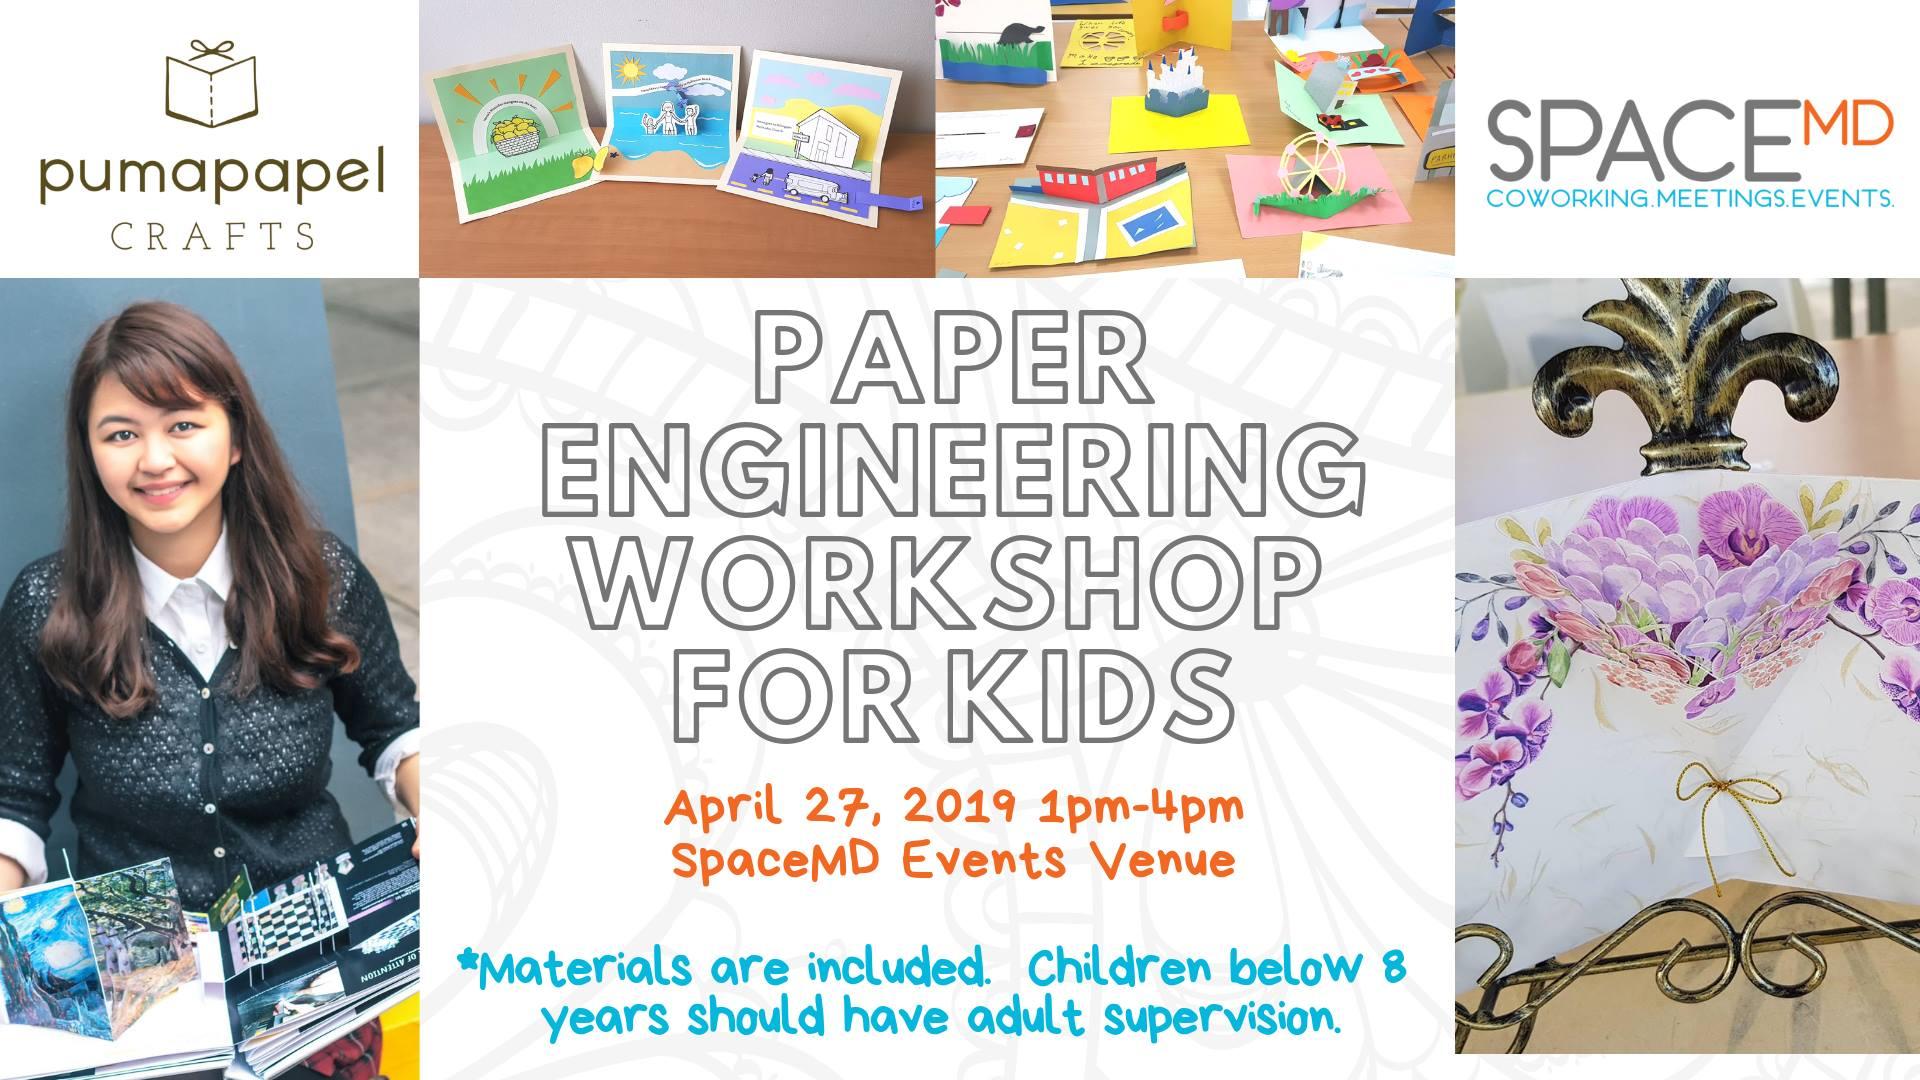 PAPER ENGINEERING WORKSHOP FOR KIDS